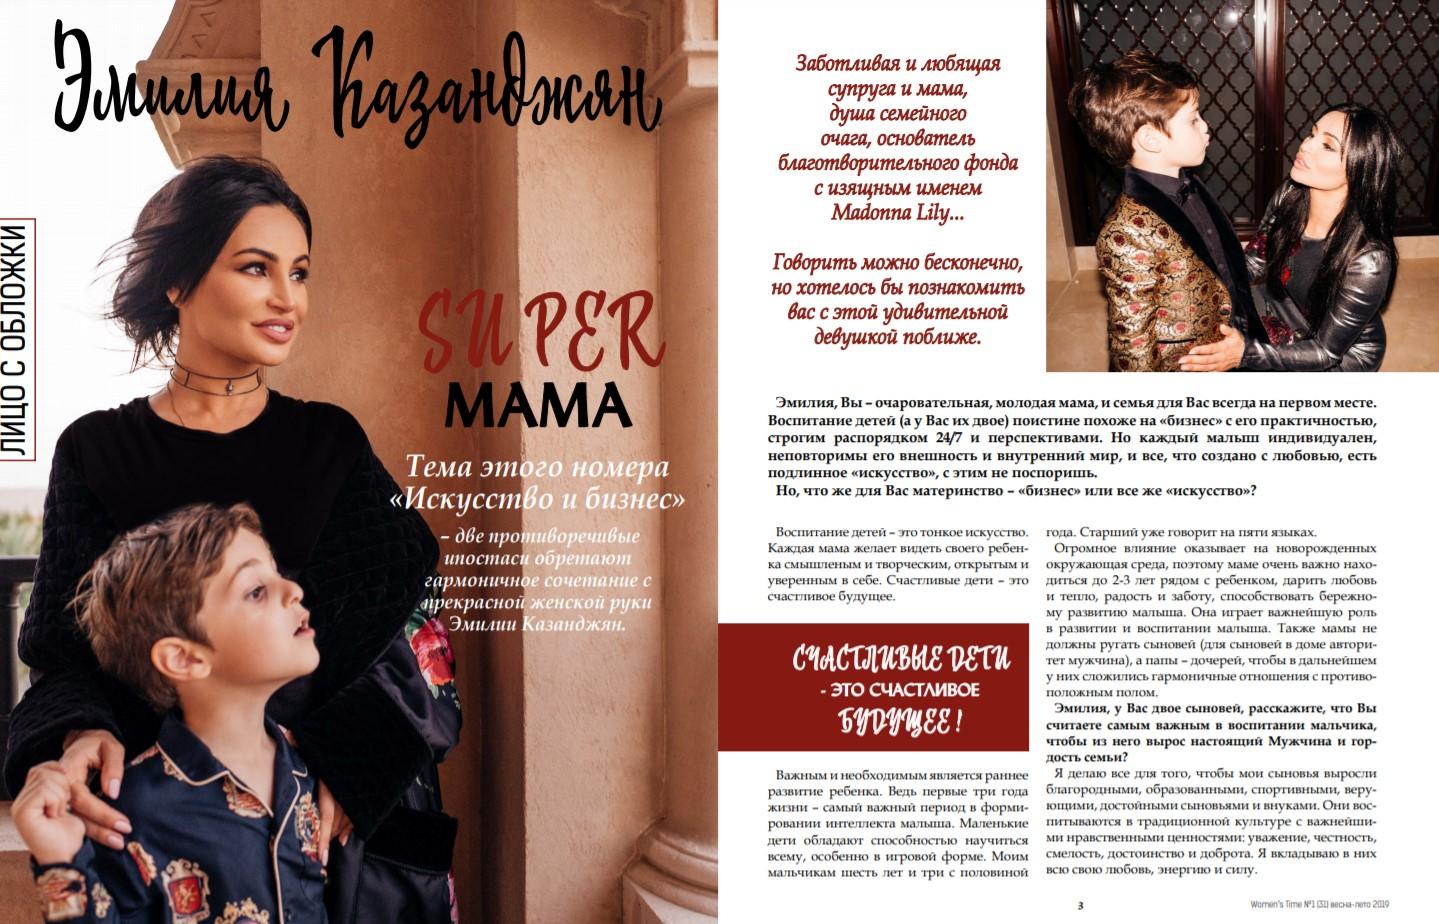 emiliya-kazandzhyan-super-mama-womenstime-1